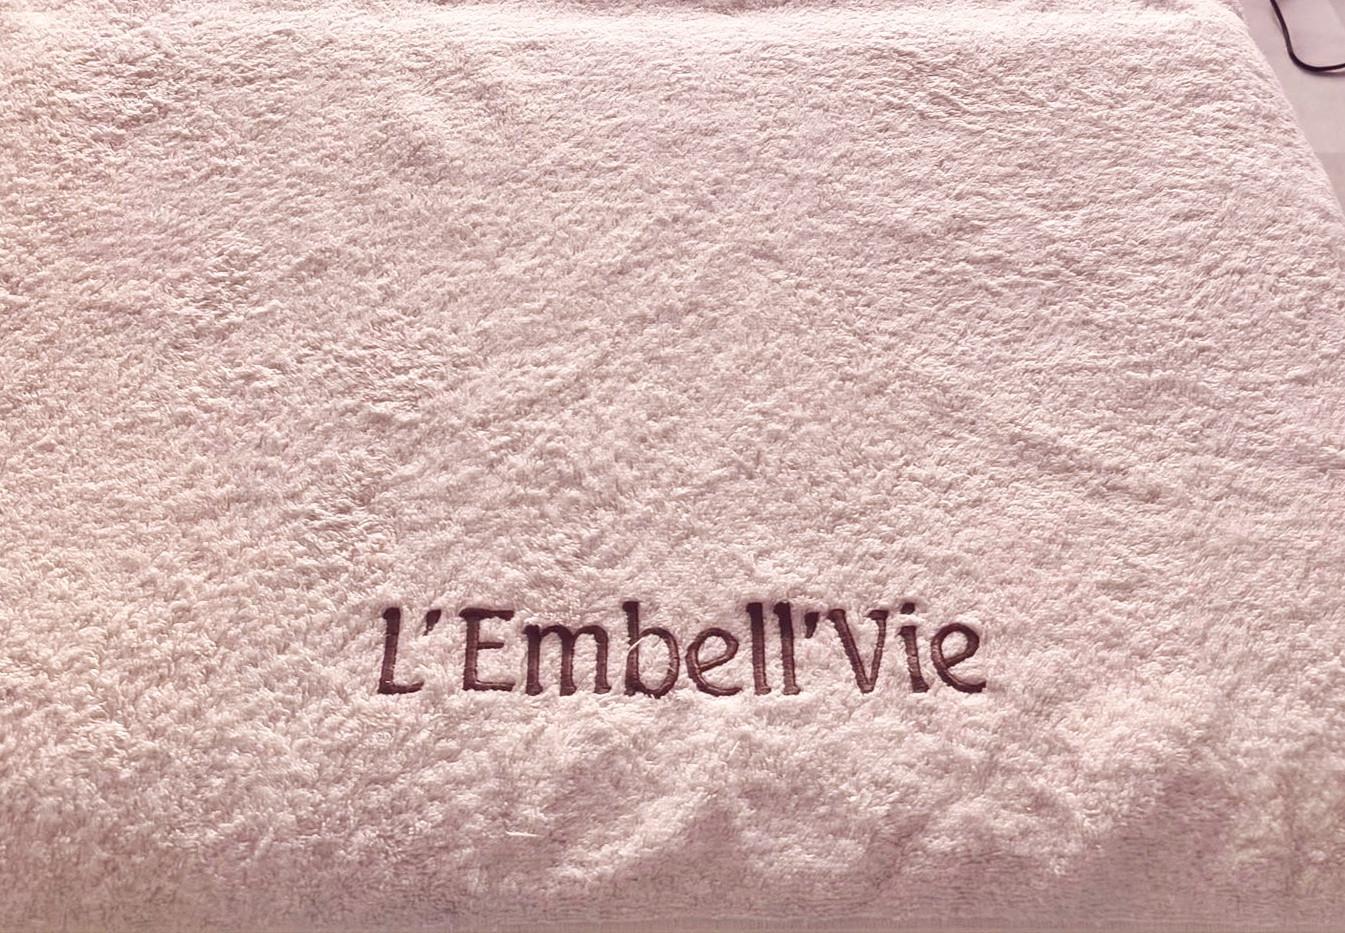 socioesthetique_lembell'vie_cancer